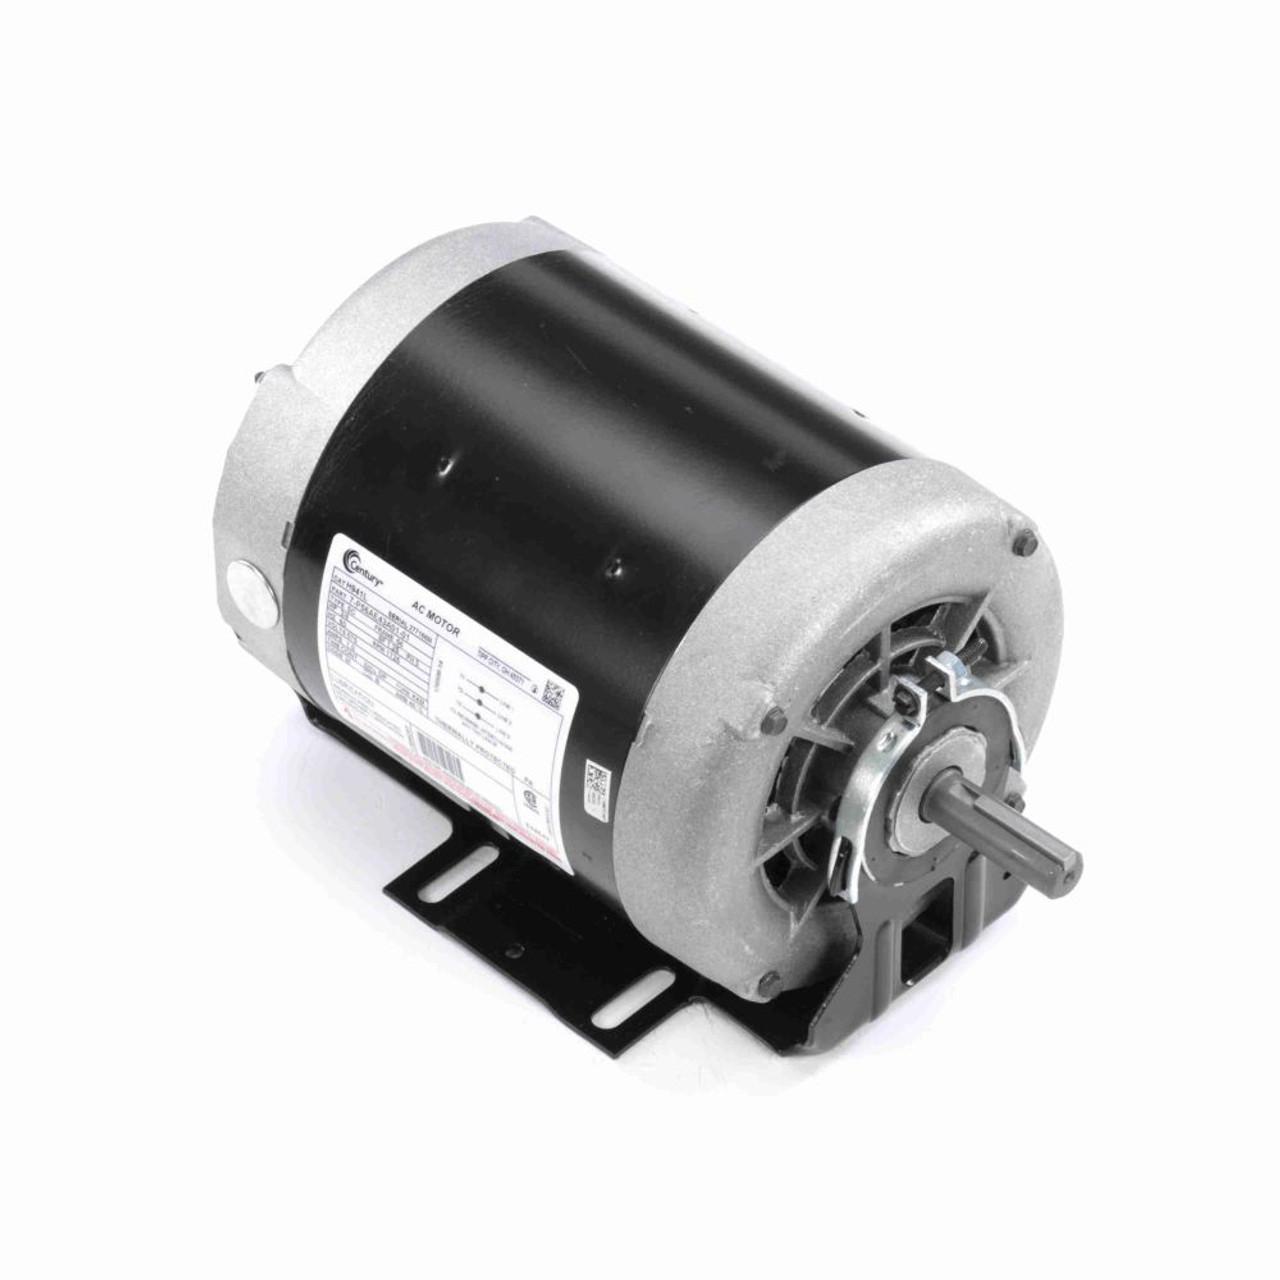 hight resolution of century 4 in 1 motor capacitor wiring